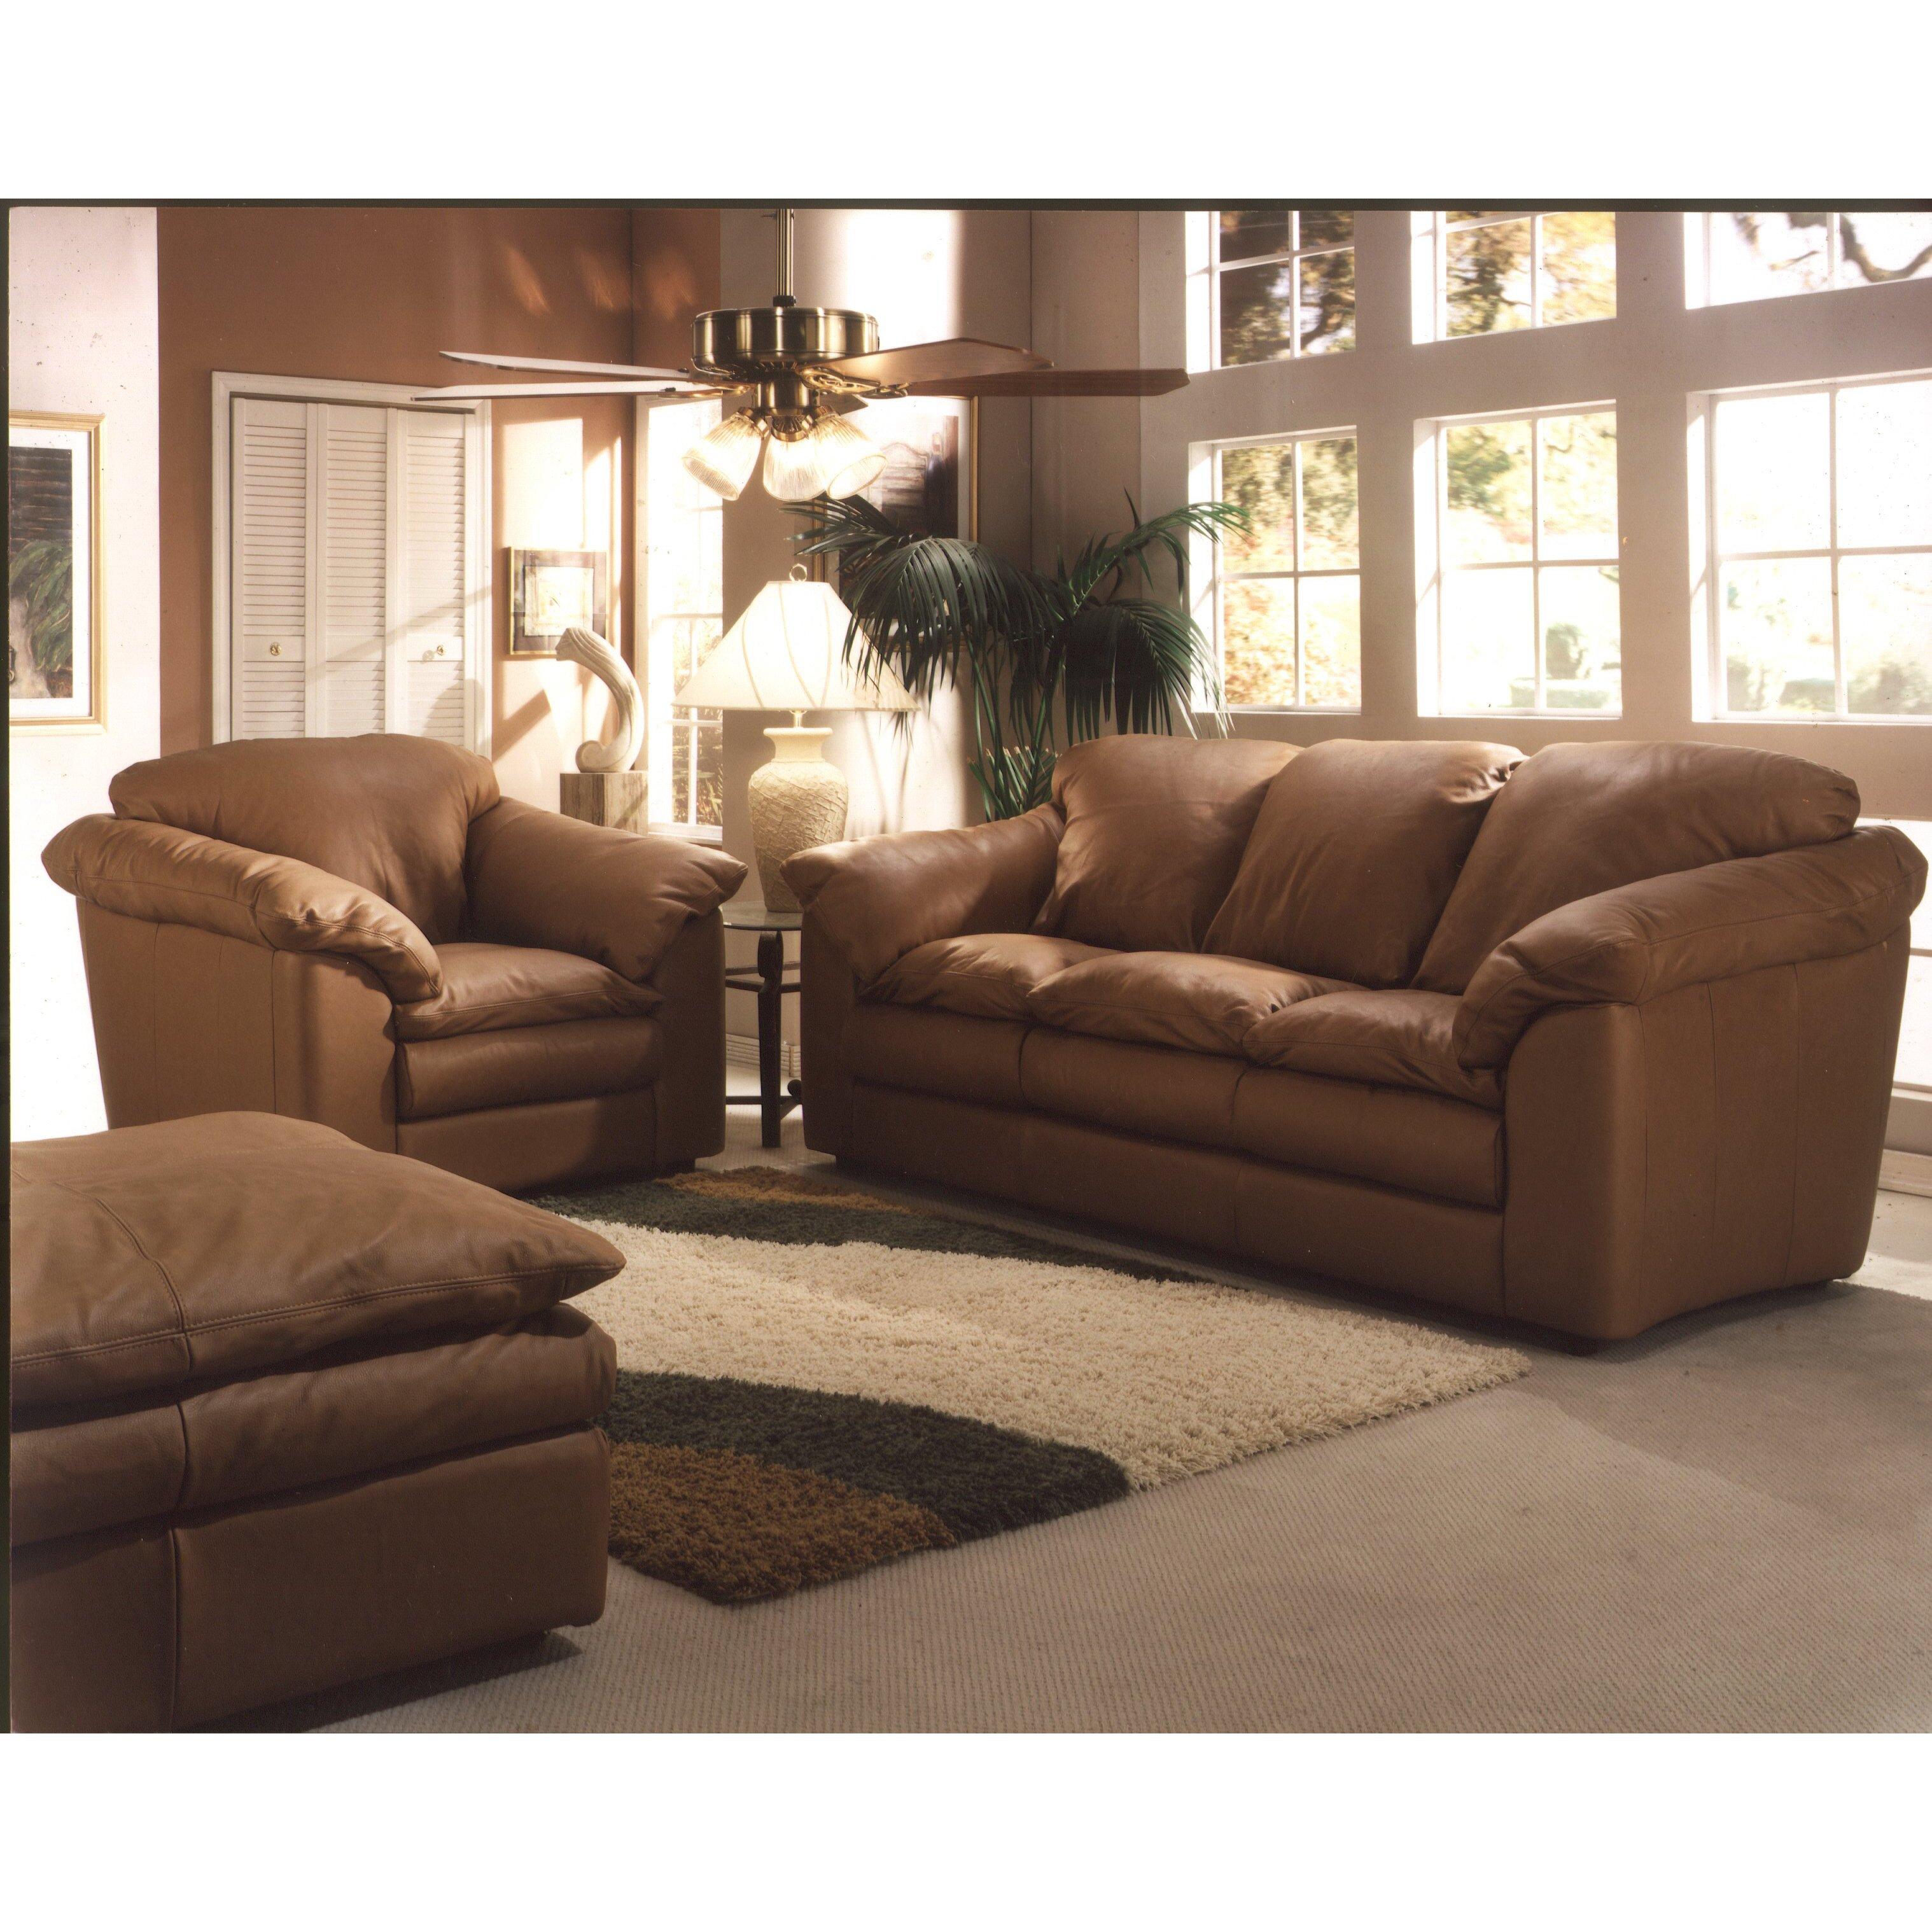 omnia furniture oregon 3 seat leather living room set